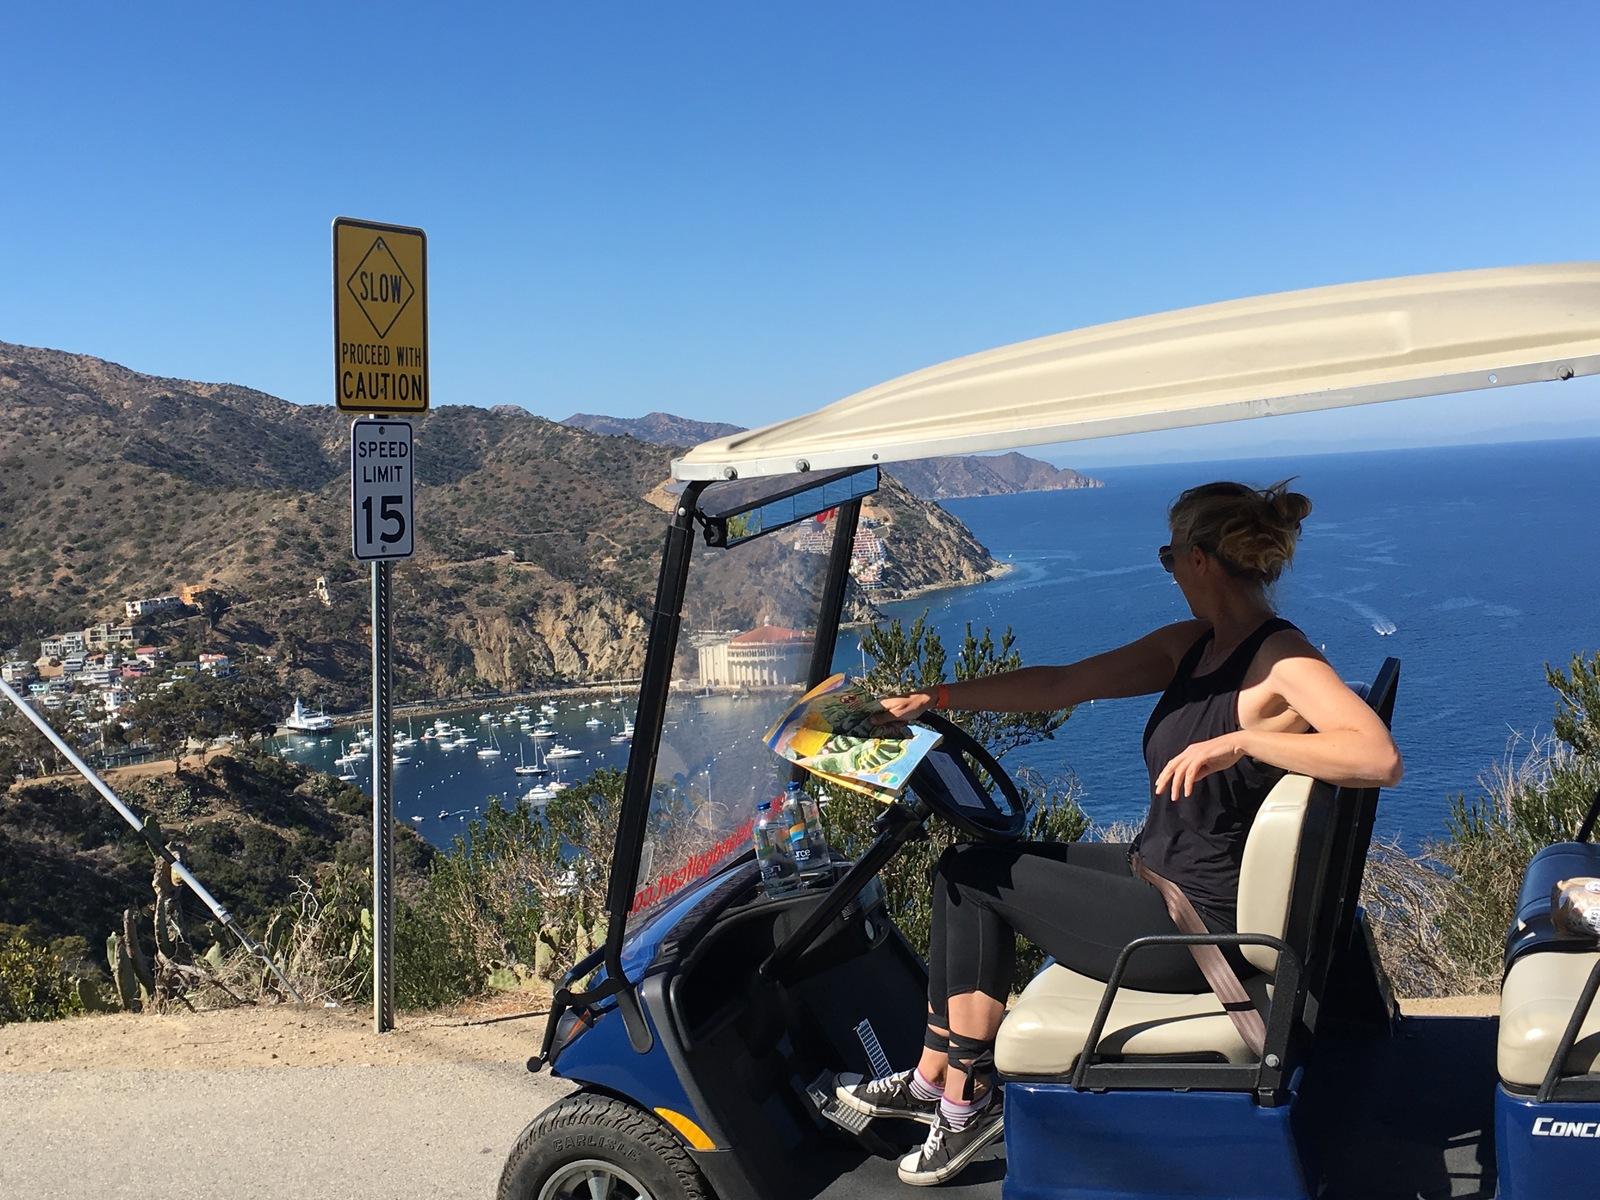 Catalina Island Golf Cart Rentals in Avalon, California ... on beach cart rentals, fork lift rentals, golf carts for rent,